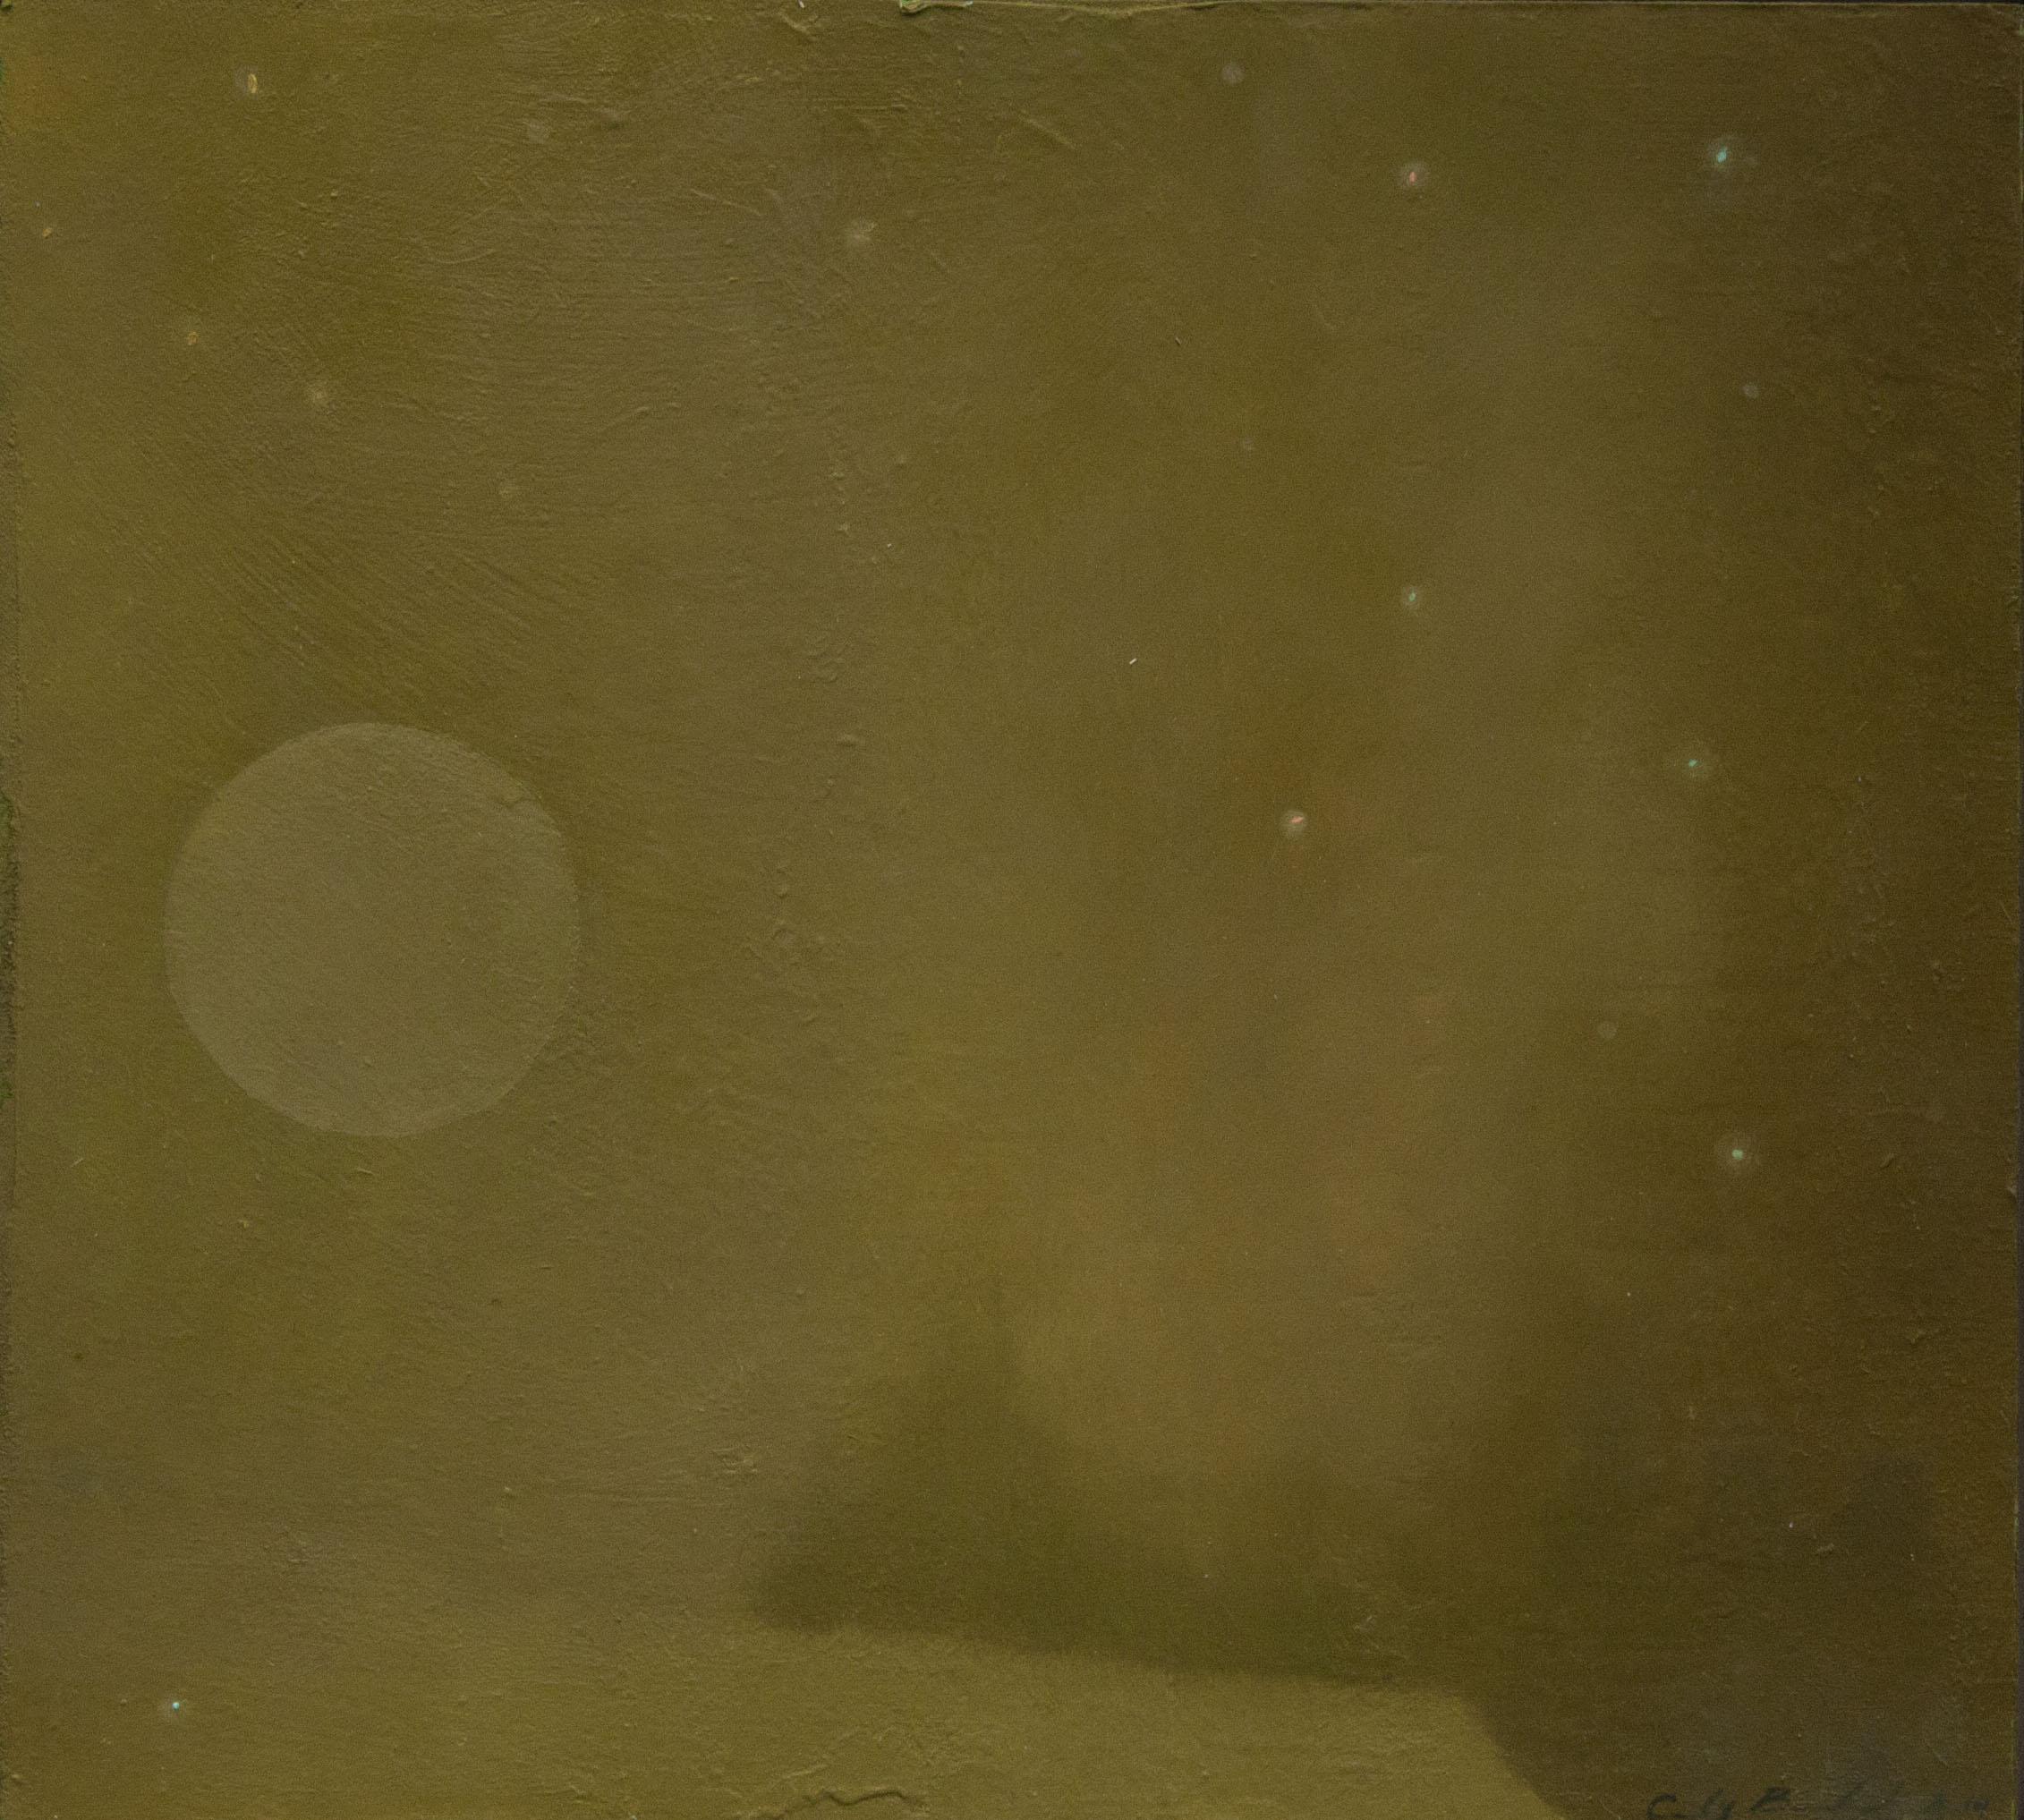 """St. Elmo,"" 2014, oil on paper, 10x9 in."